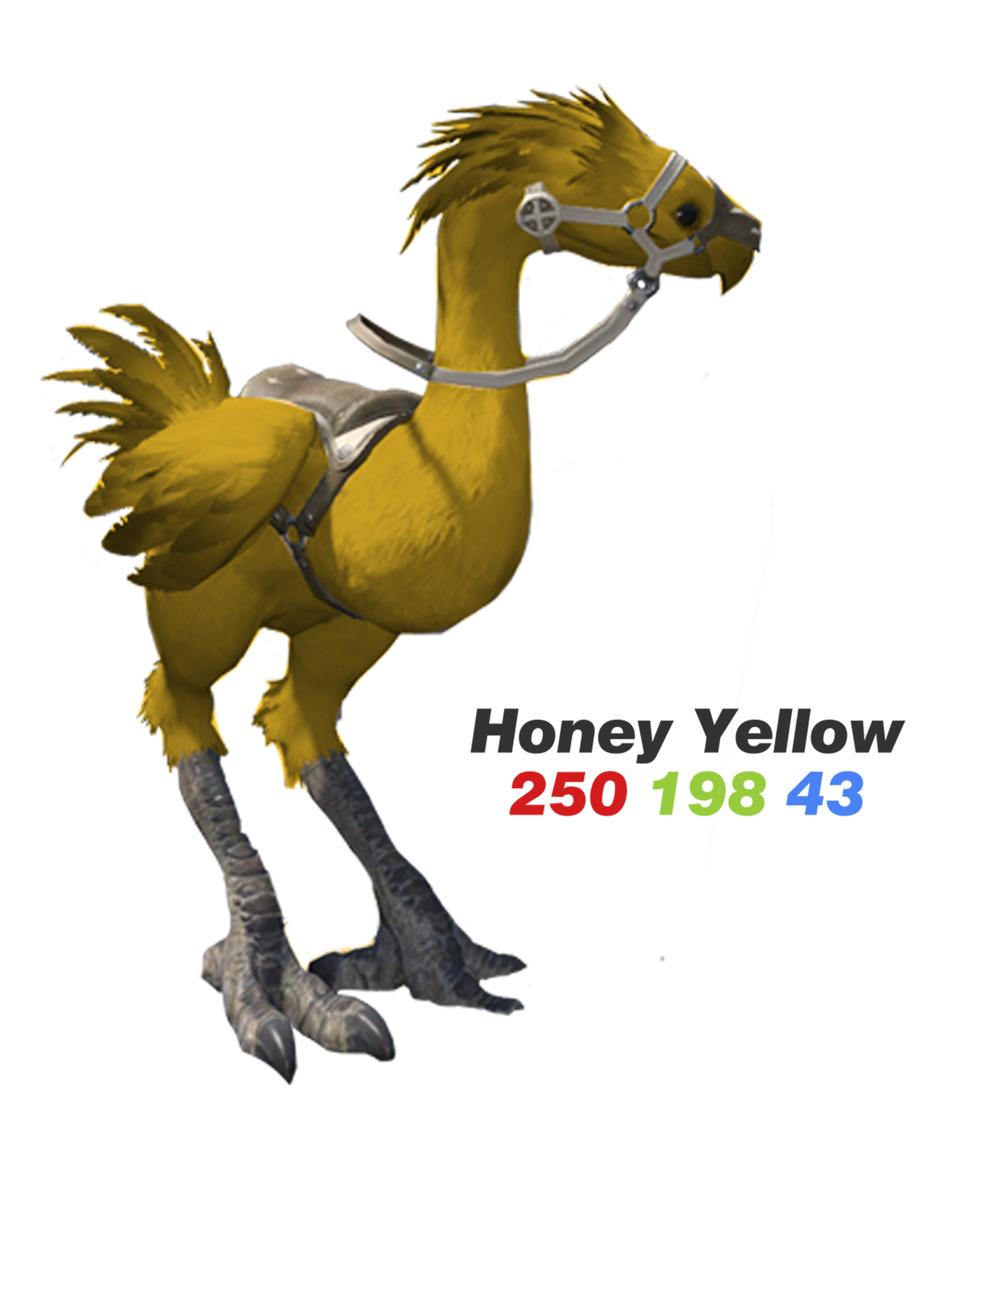 HoneyYellow.png